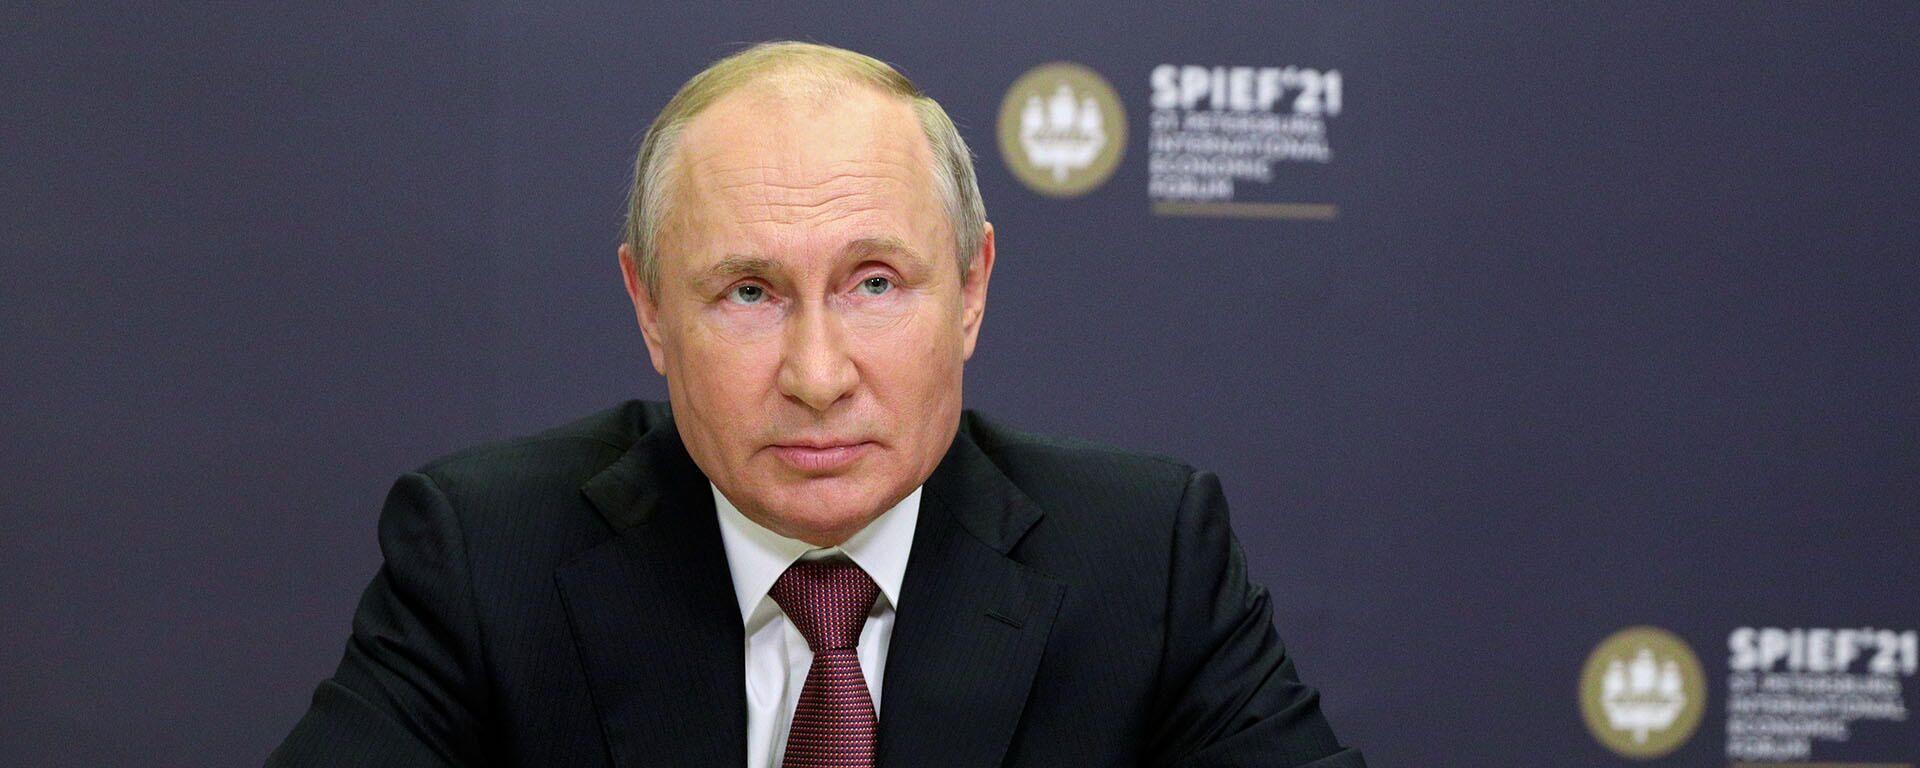 Путин о преследовании российских журналистов за рубежом - Sputnik Таджикистан, 1920, 08.06.2021